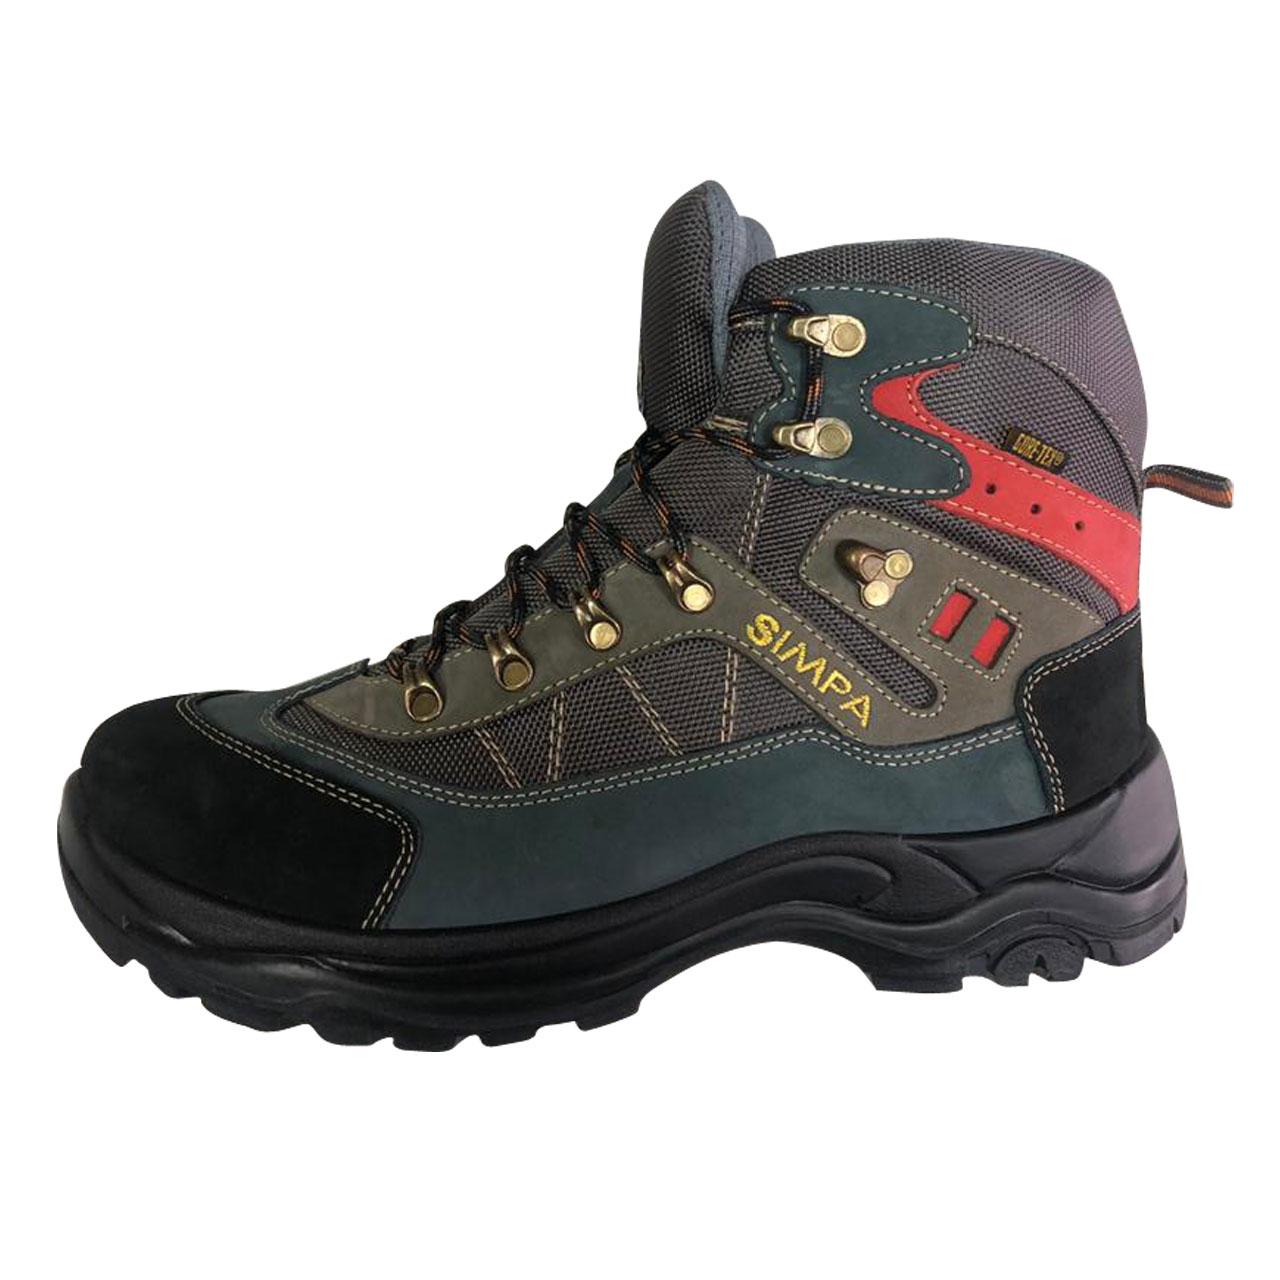 کفش کوهنوردی مردانه سیمپا مدل دنا کد IGD